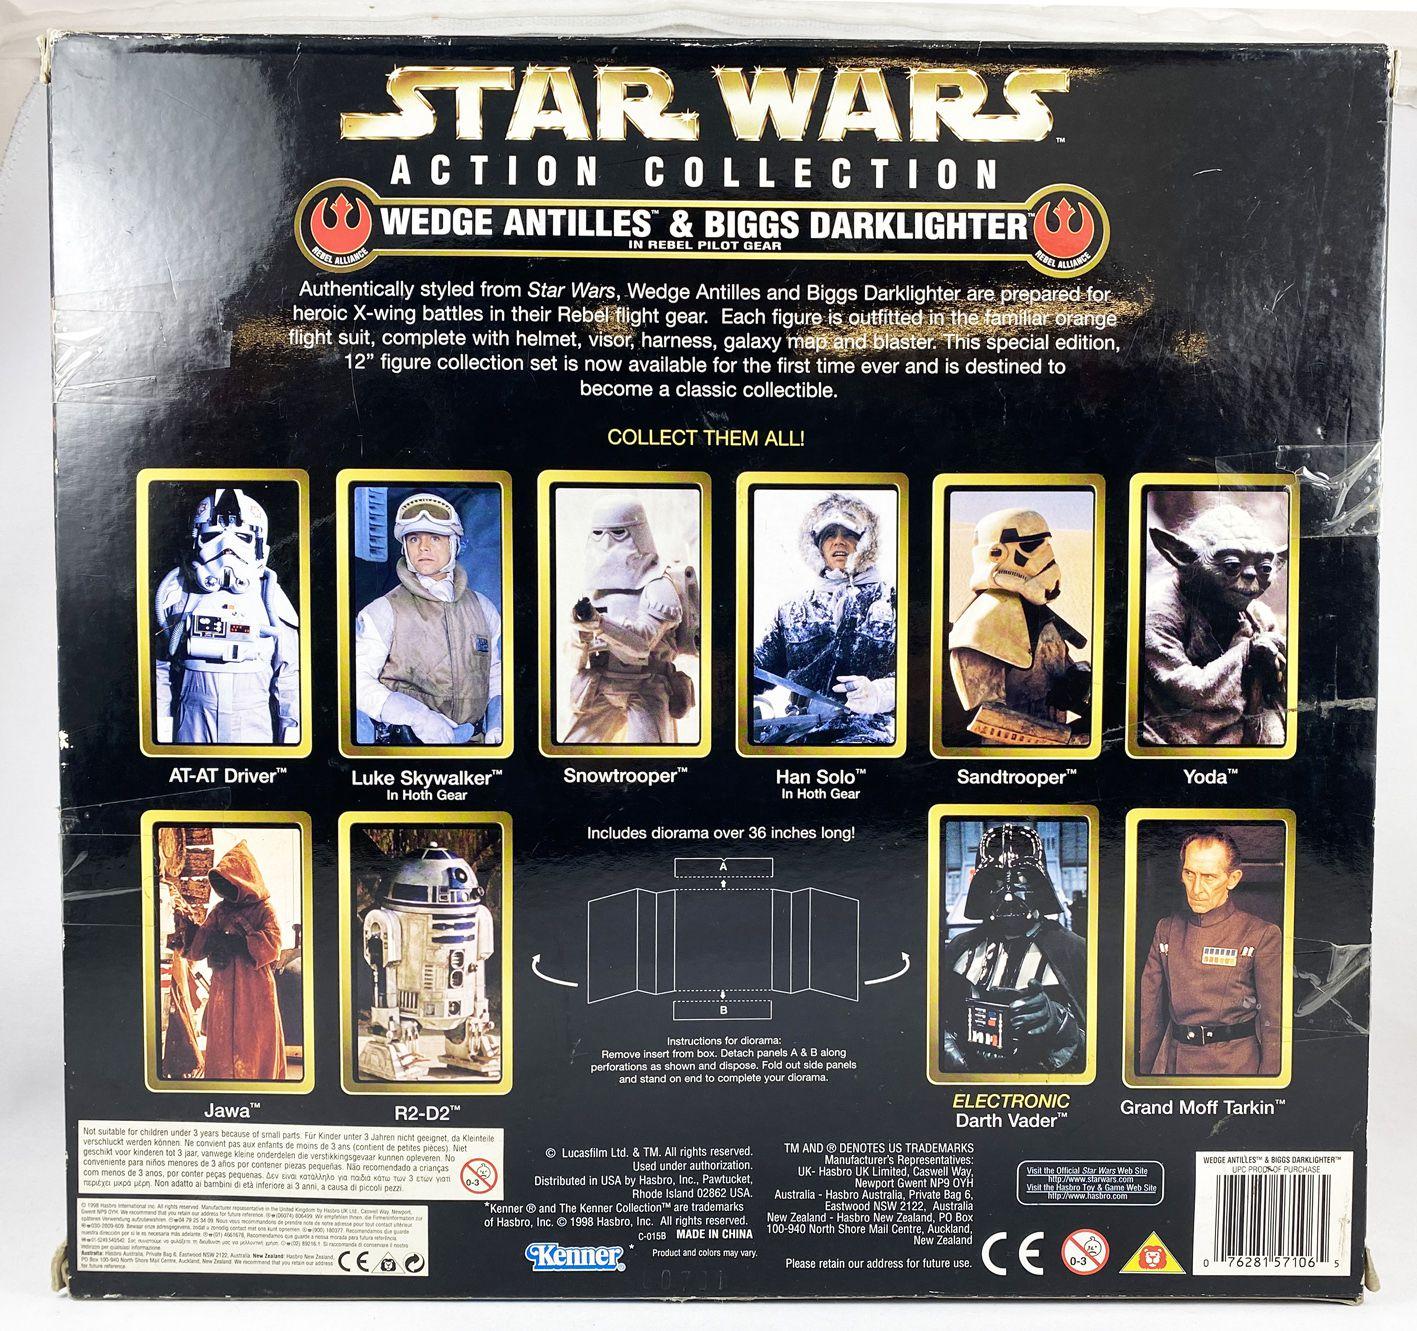 Star Wars Action Collection - Kenner - Wedge Antiles & Biggs Darklighter (in Rebel Gear)